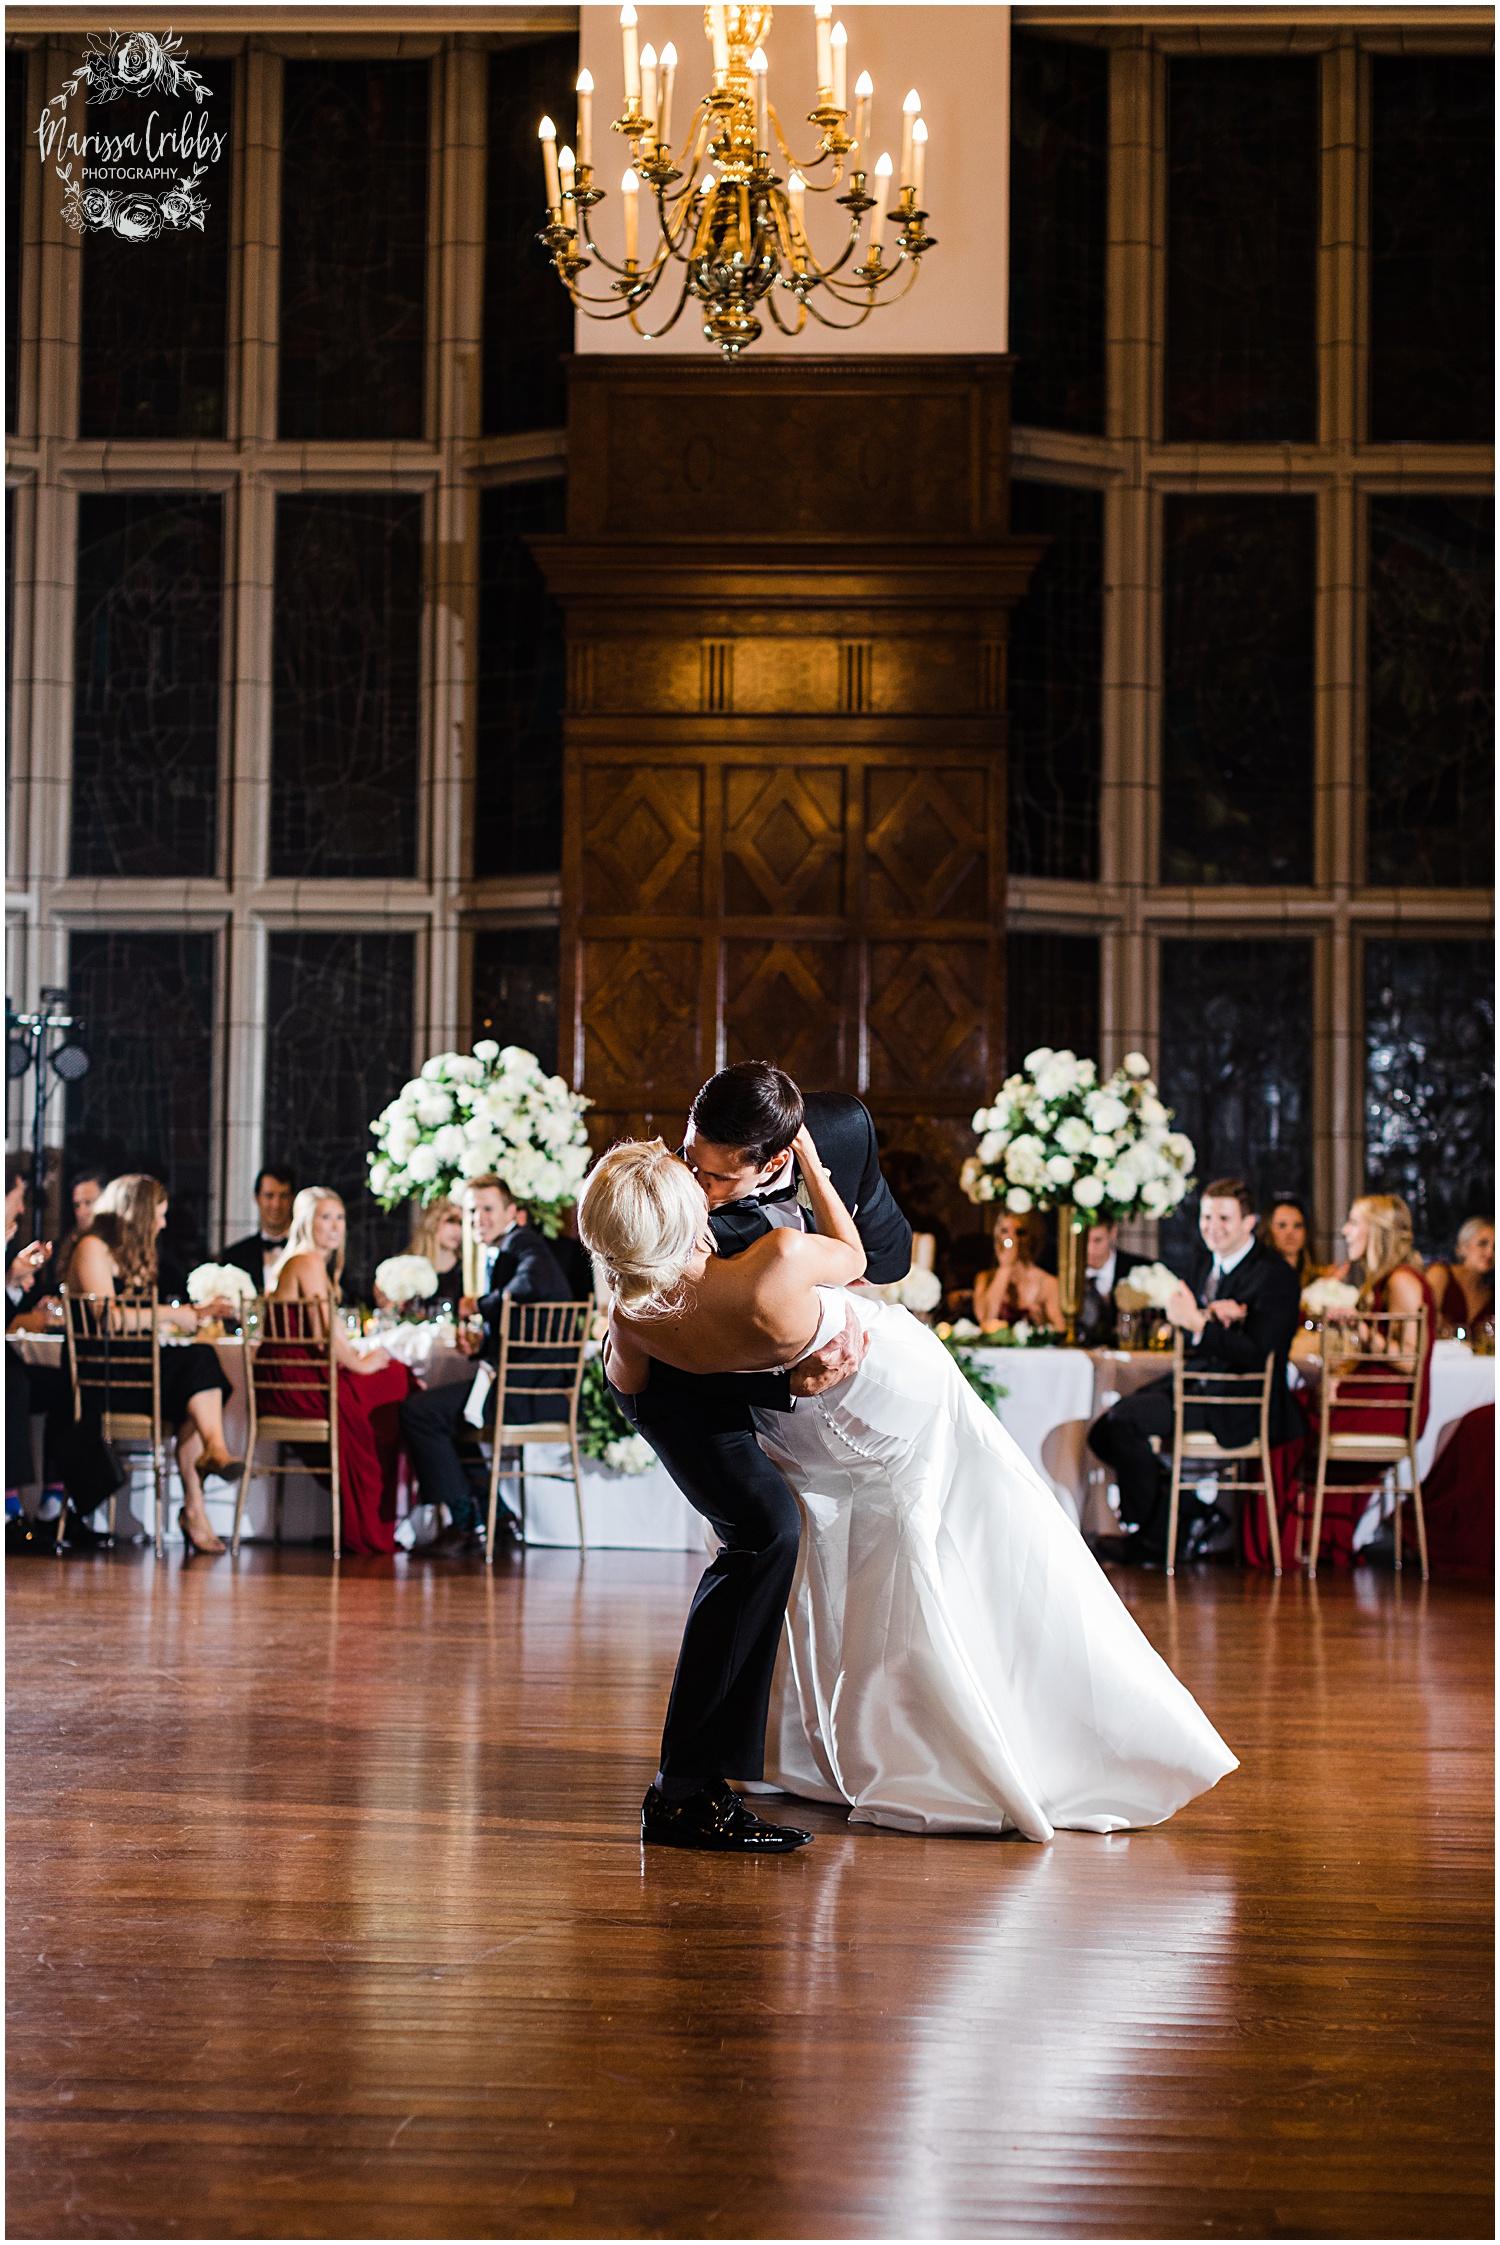 NOLL WEDDING | THE BRASS ON BALTIMORE | MARISSA CRIBBS PHOTOGRAPHY_6379.jpg